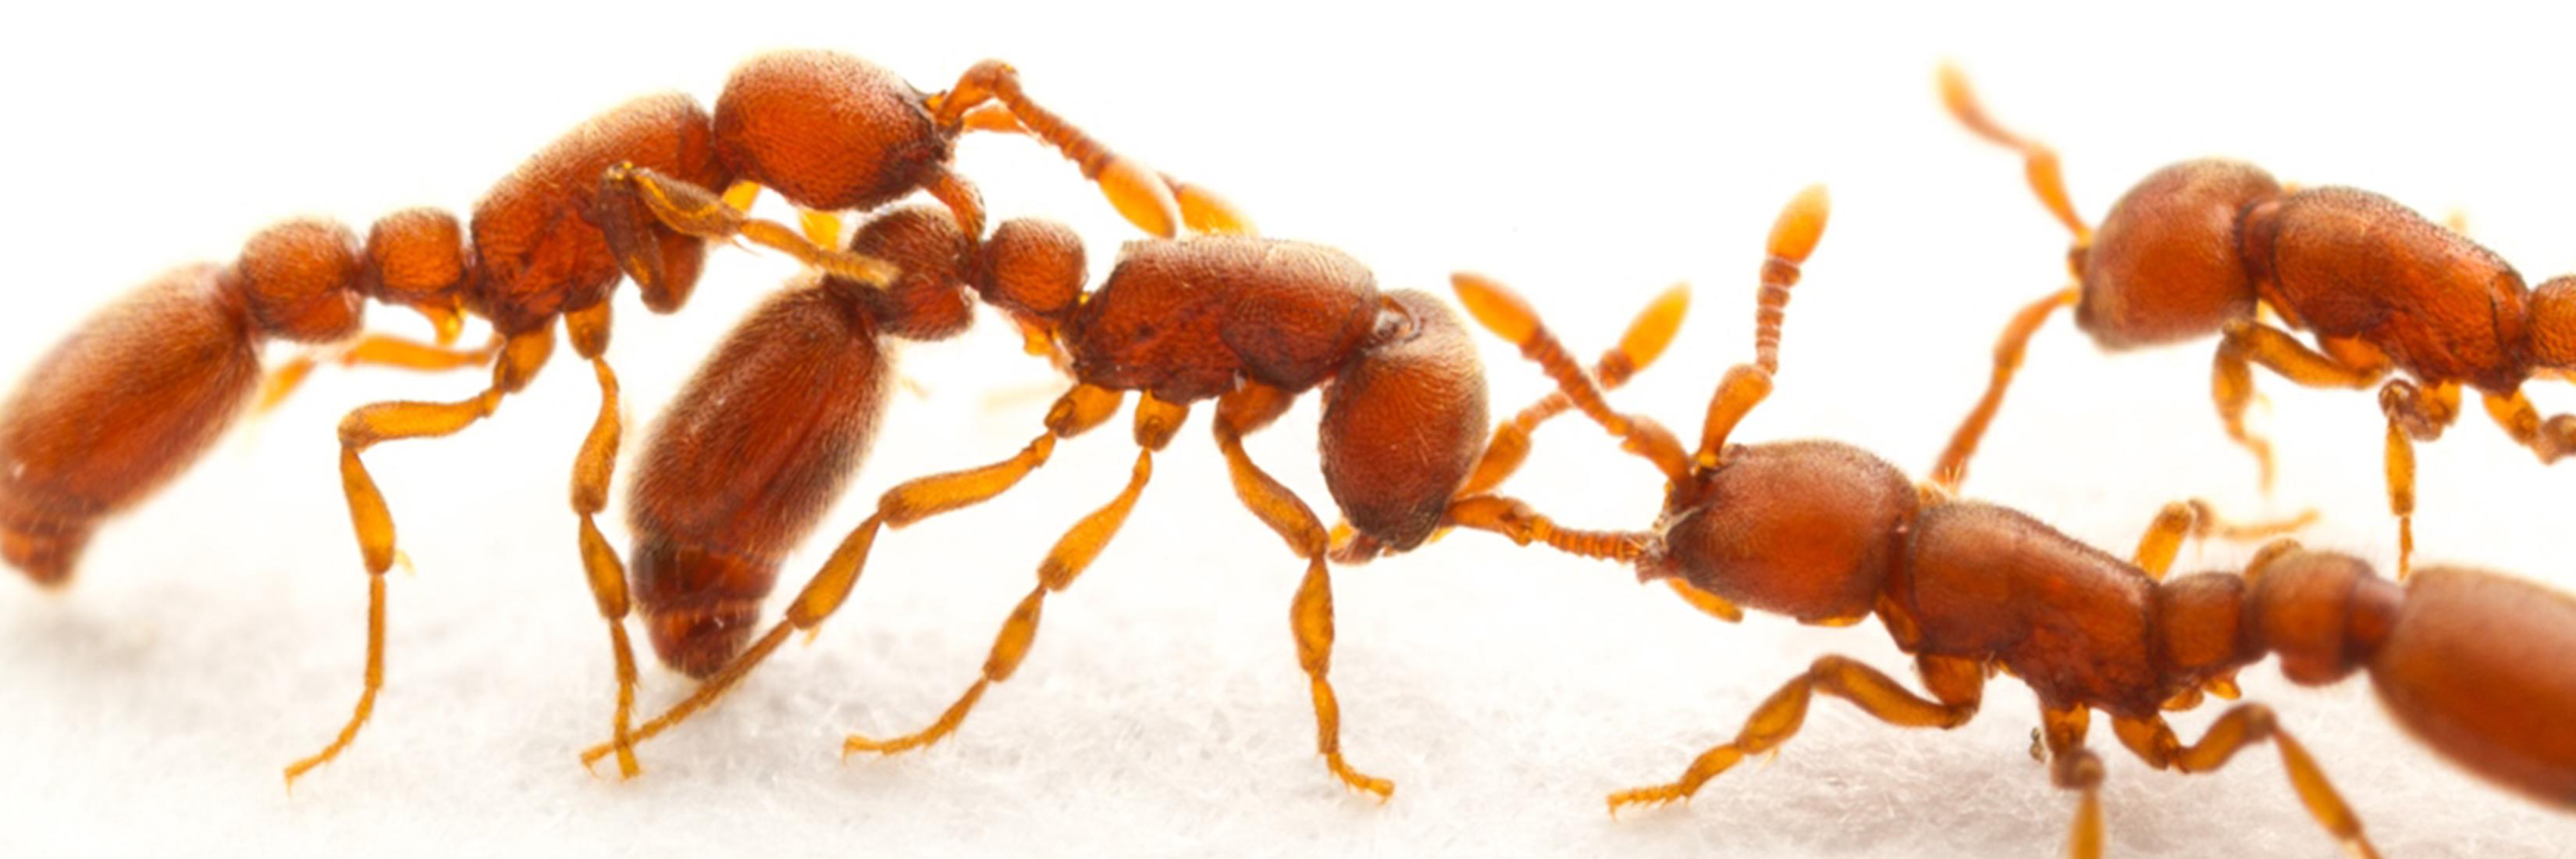 Clonal Ants Antennae